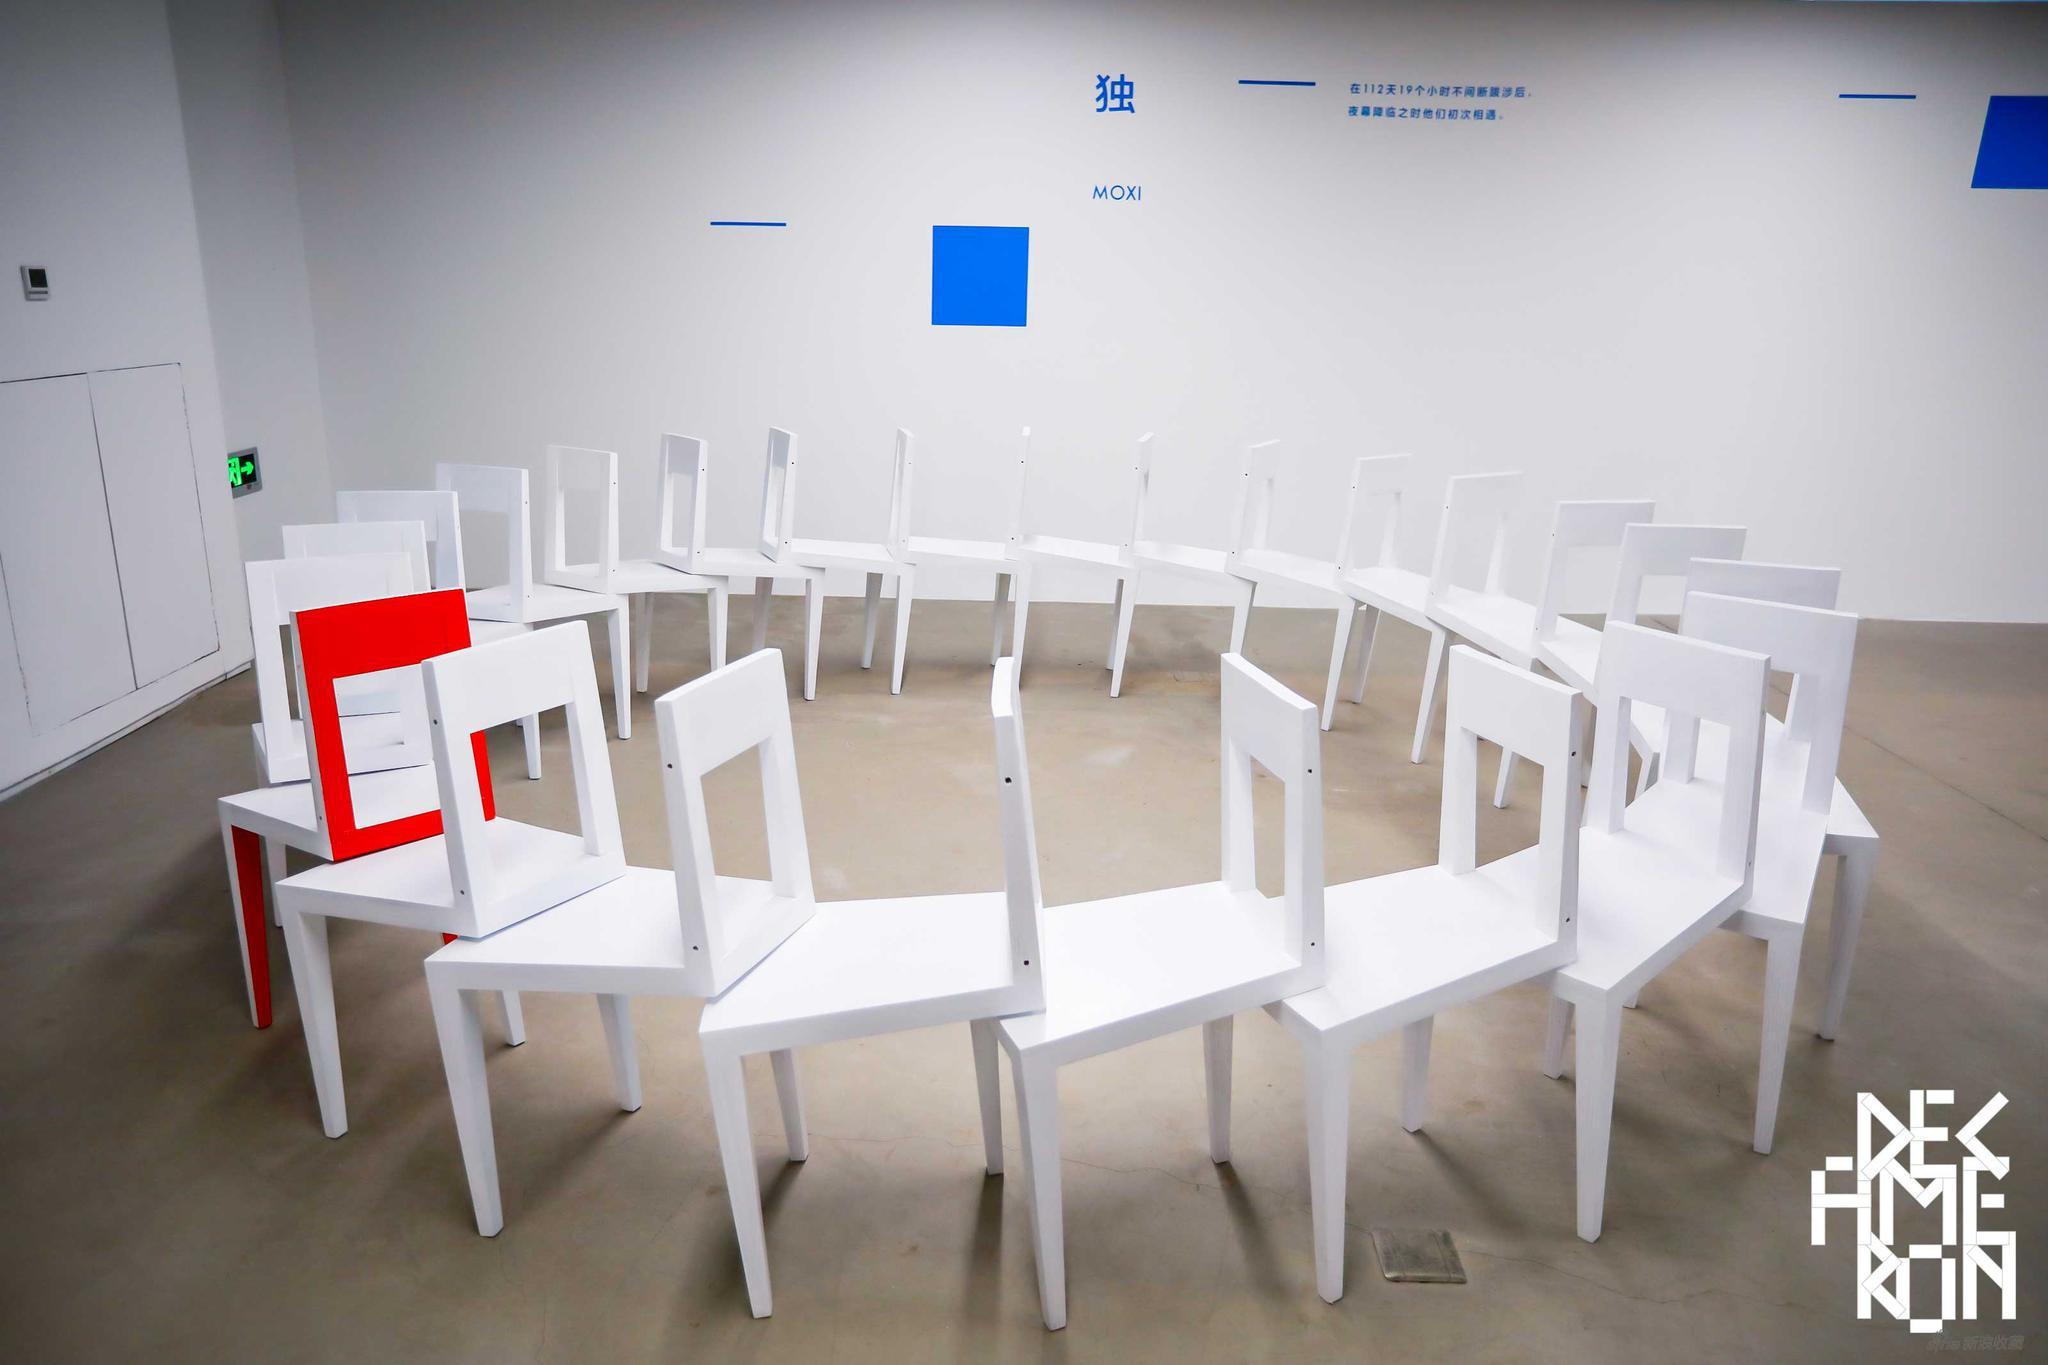 MOXI 《独》 装置 木质,橡木镶贴,亮面清漆 总体尺寸300cm×80cm单只尺寸80cm×37cm×45cm 2019